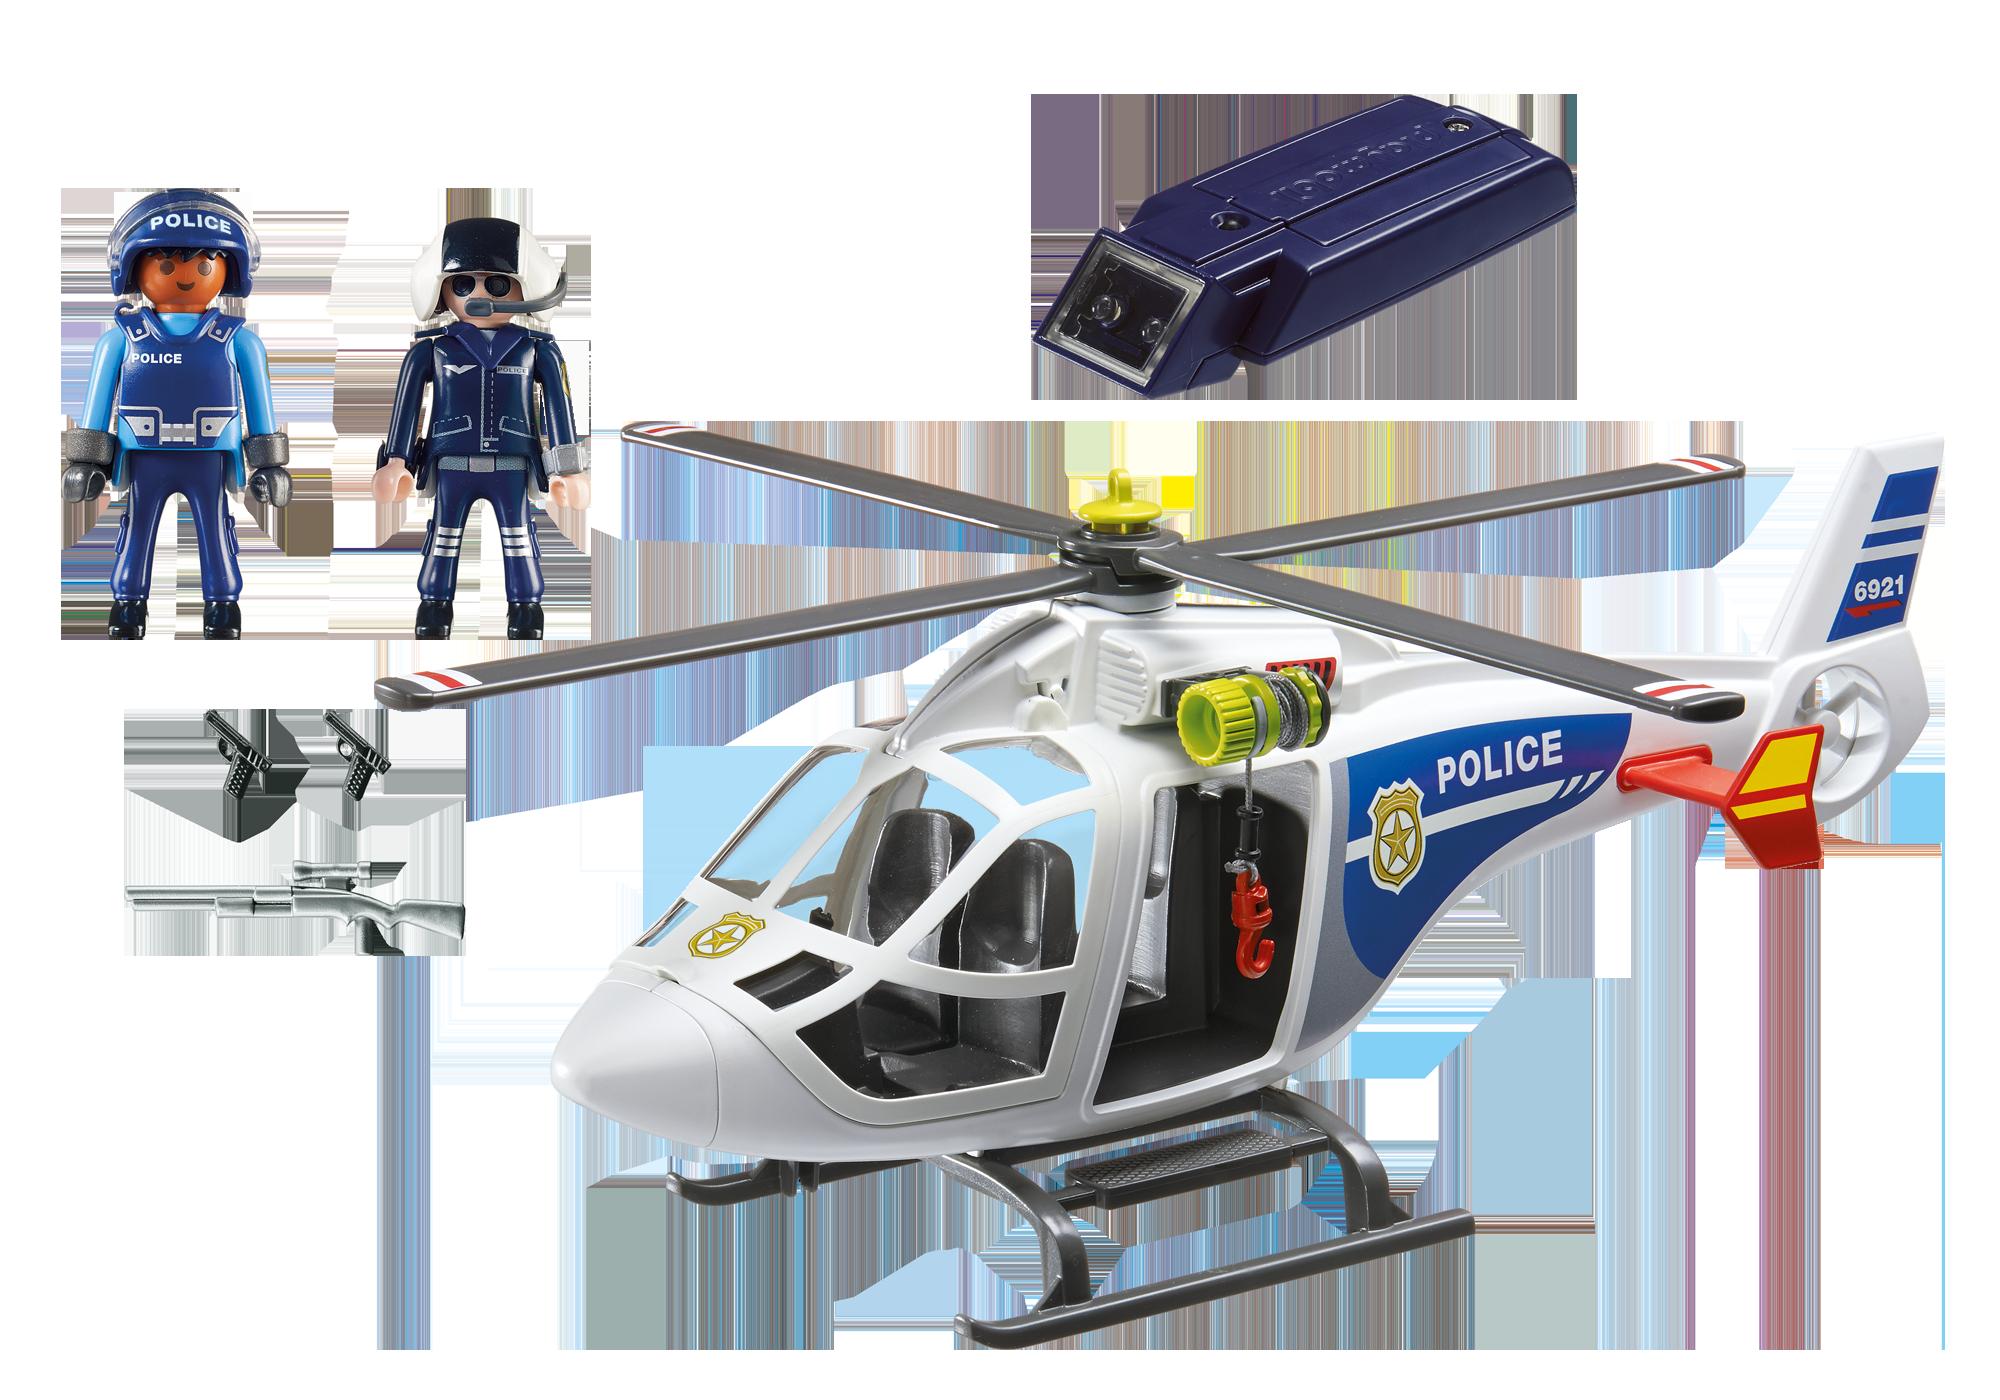 http://media.playmobil.com/i/playmobil/6921_product_box_back/Helicóptero de Policía con Luces LED